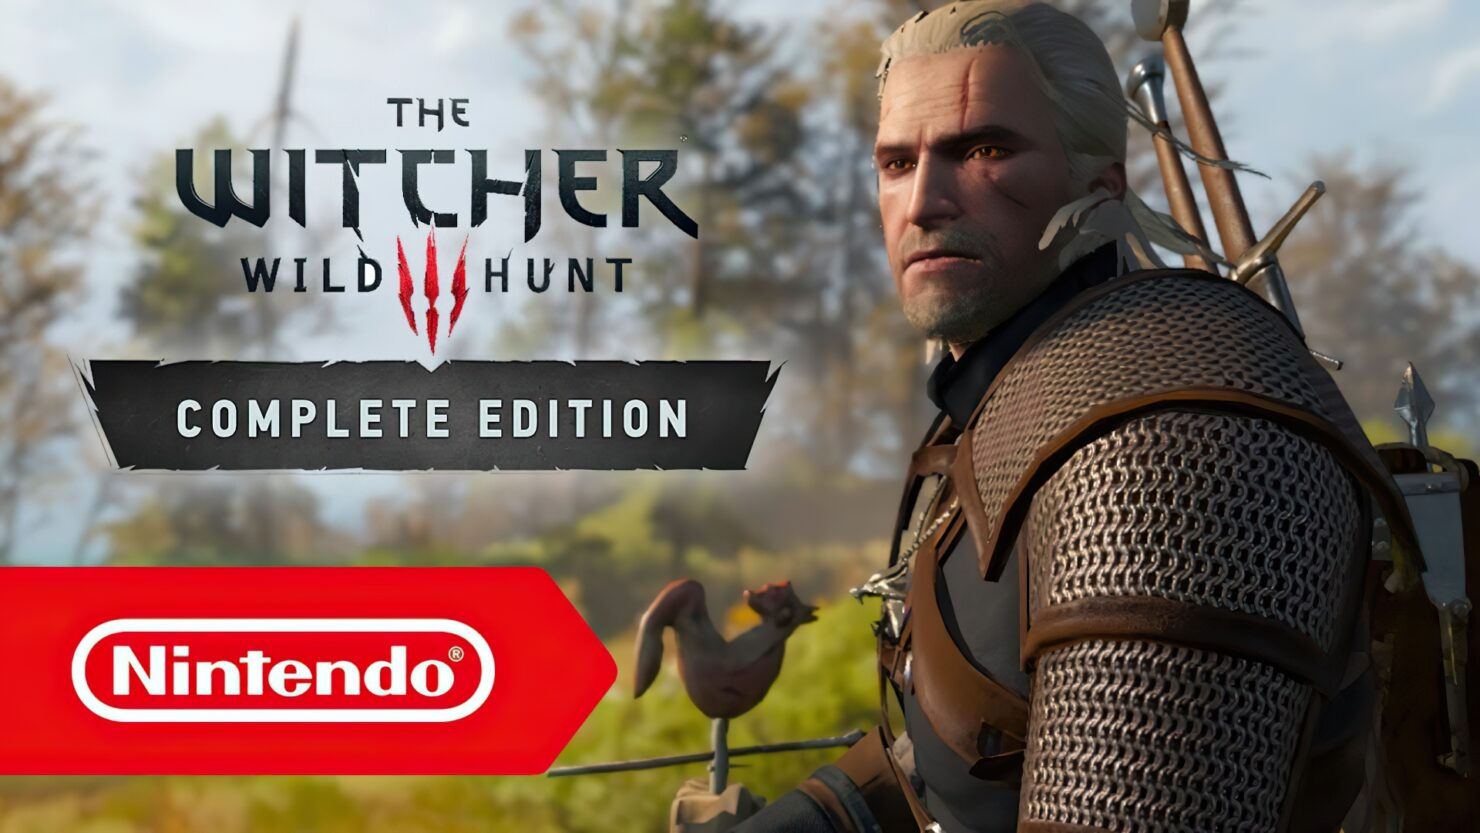 Nintendo Switch The Witcher 3